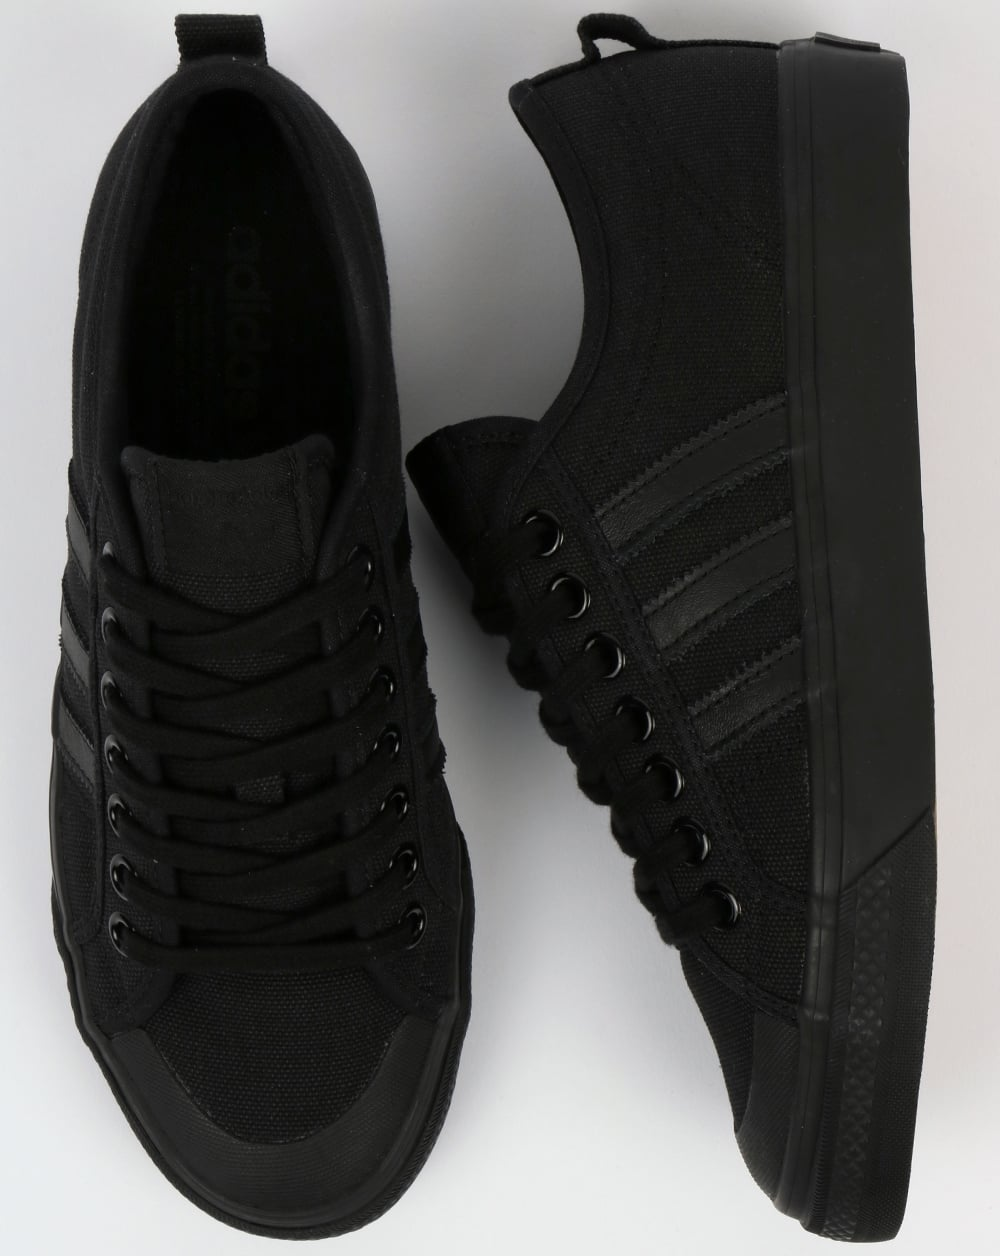 Adidas Nizza Trainers Blacklow,shoes